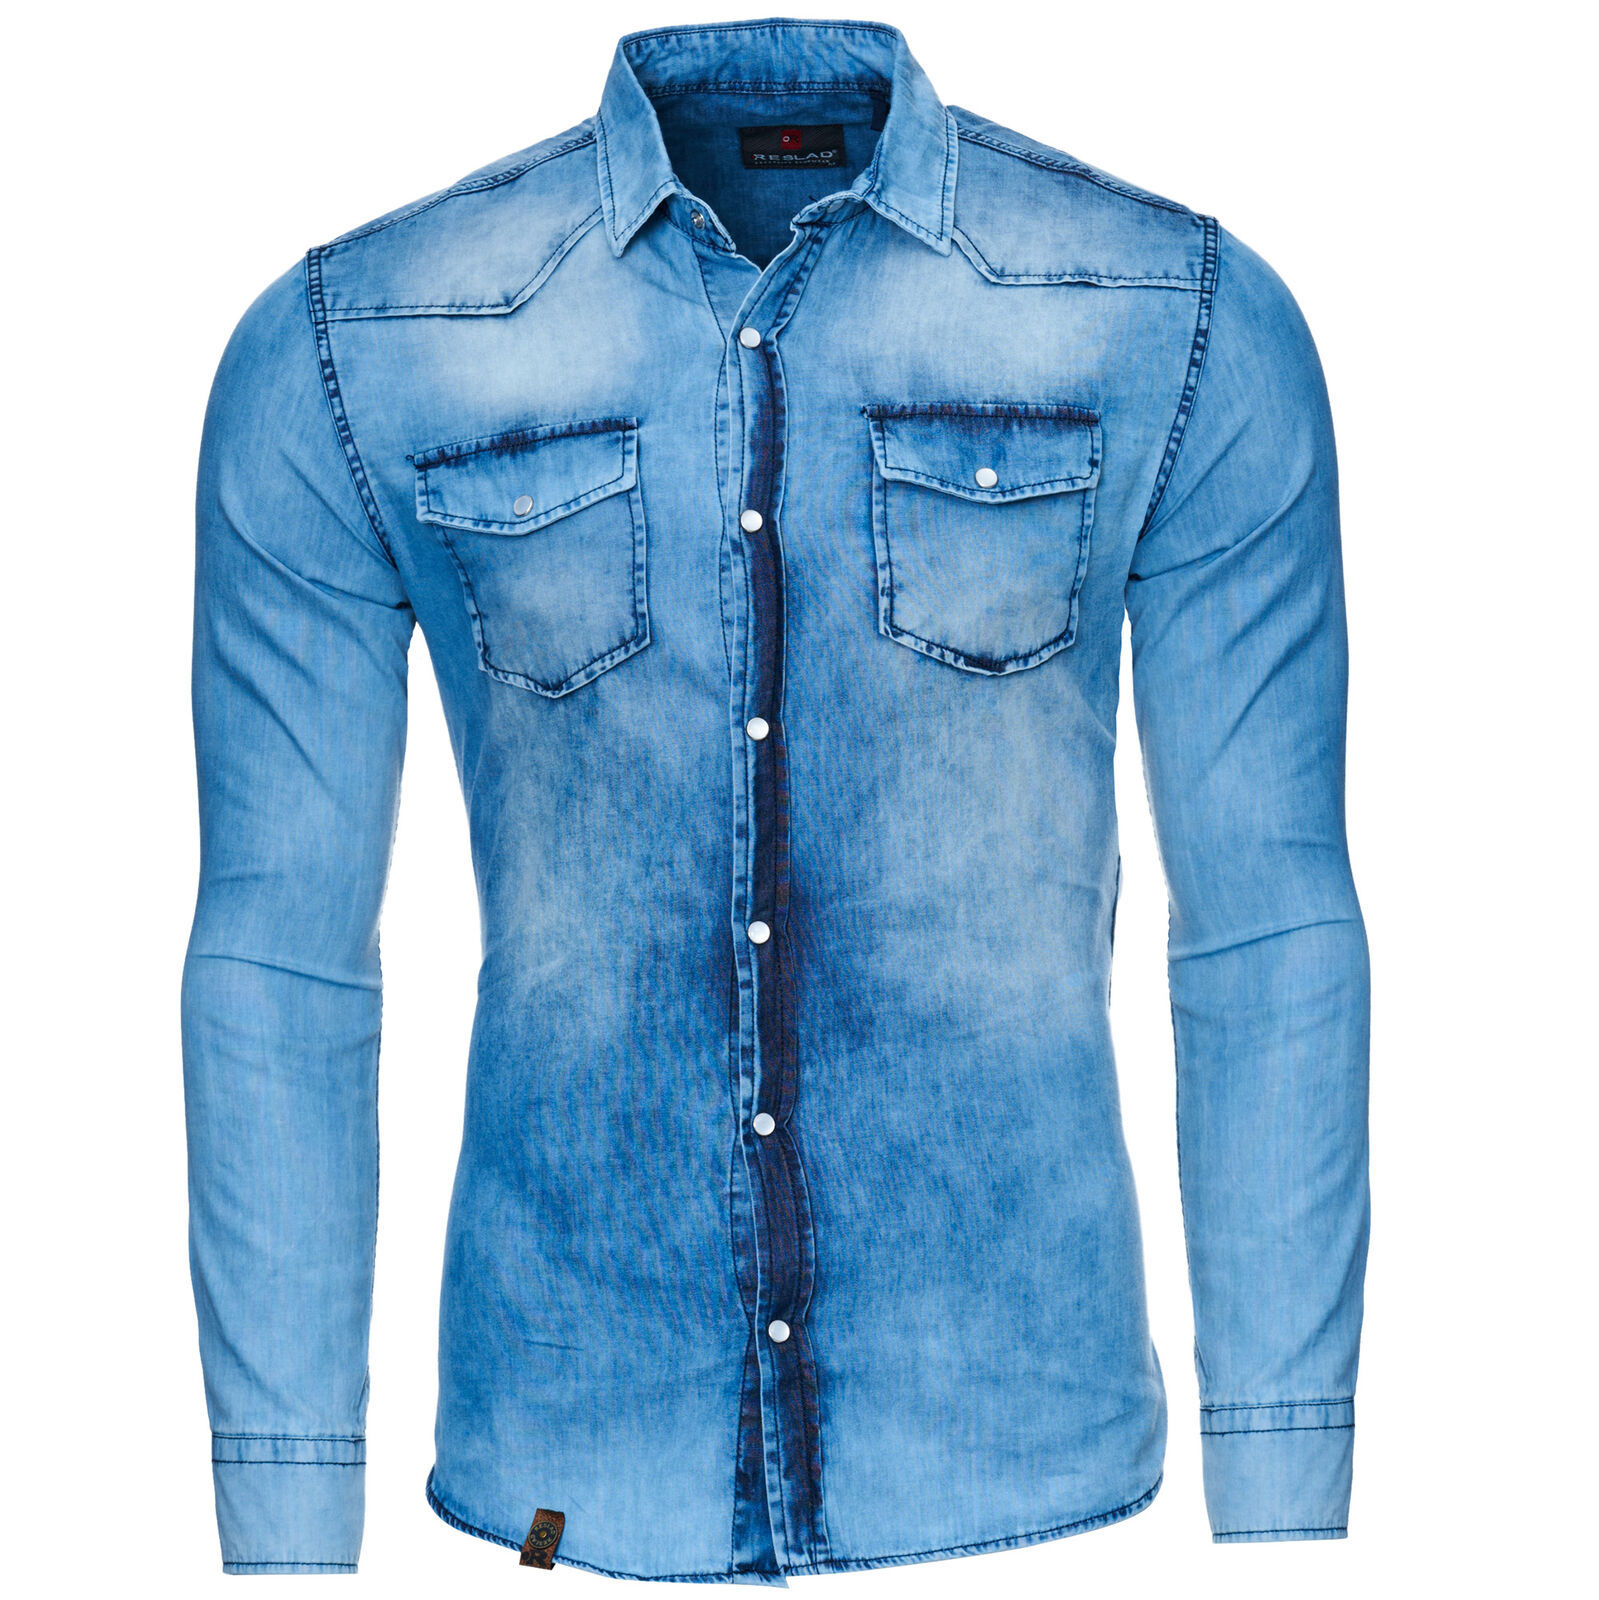 Reslad Herren Vintage Jeanshemd Denim Jeans Hemd T-Shirt Freizeithemd RS-7109